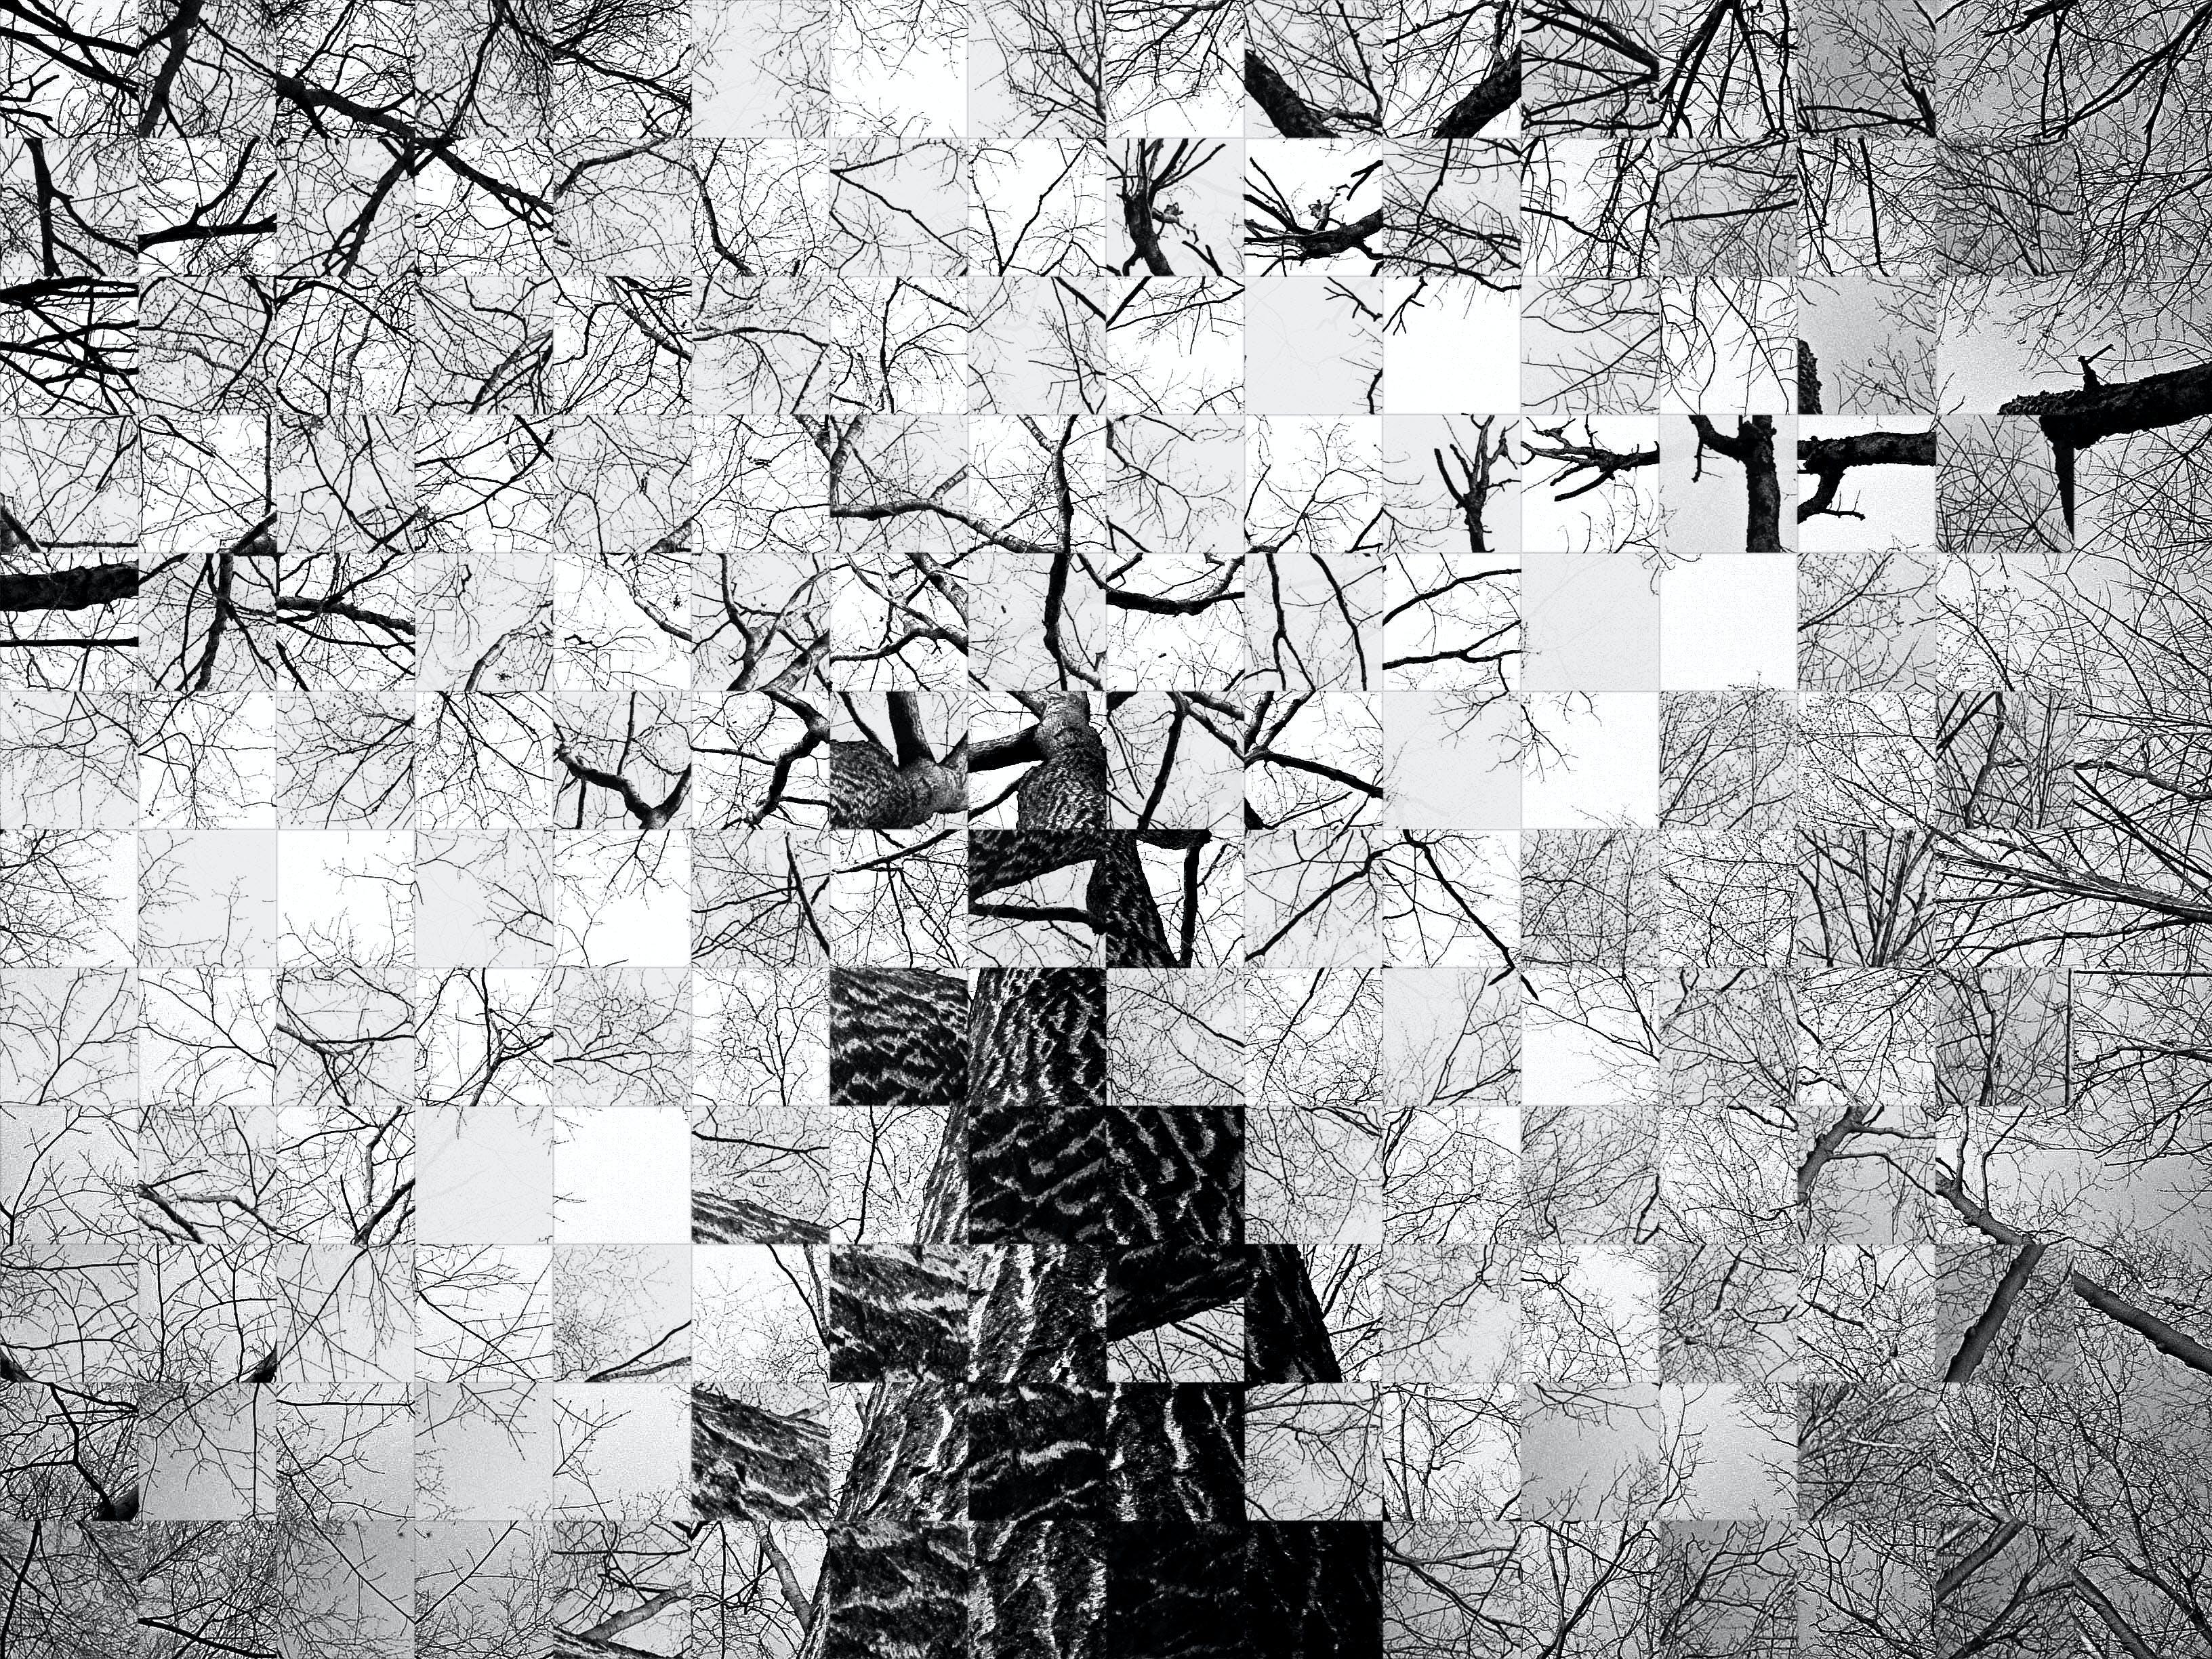 Free stock photo of Generative art, Broken tree, justifyyourlove